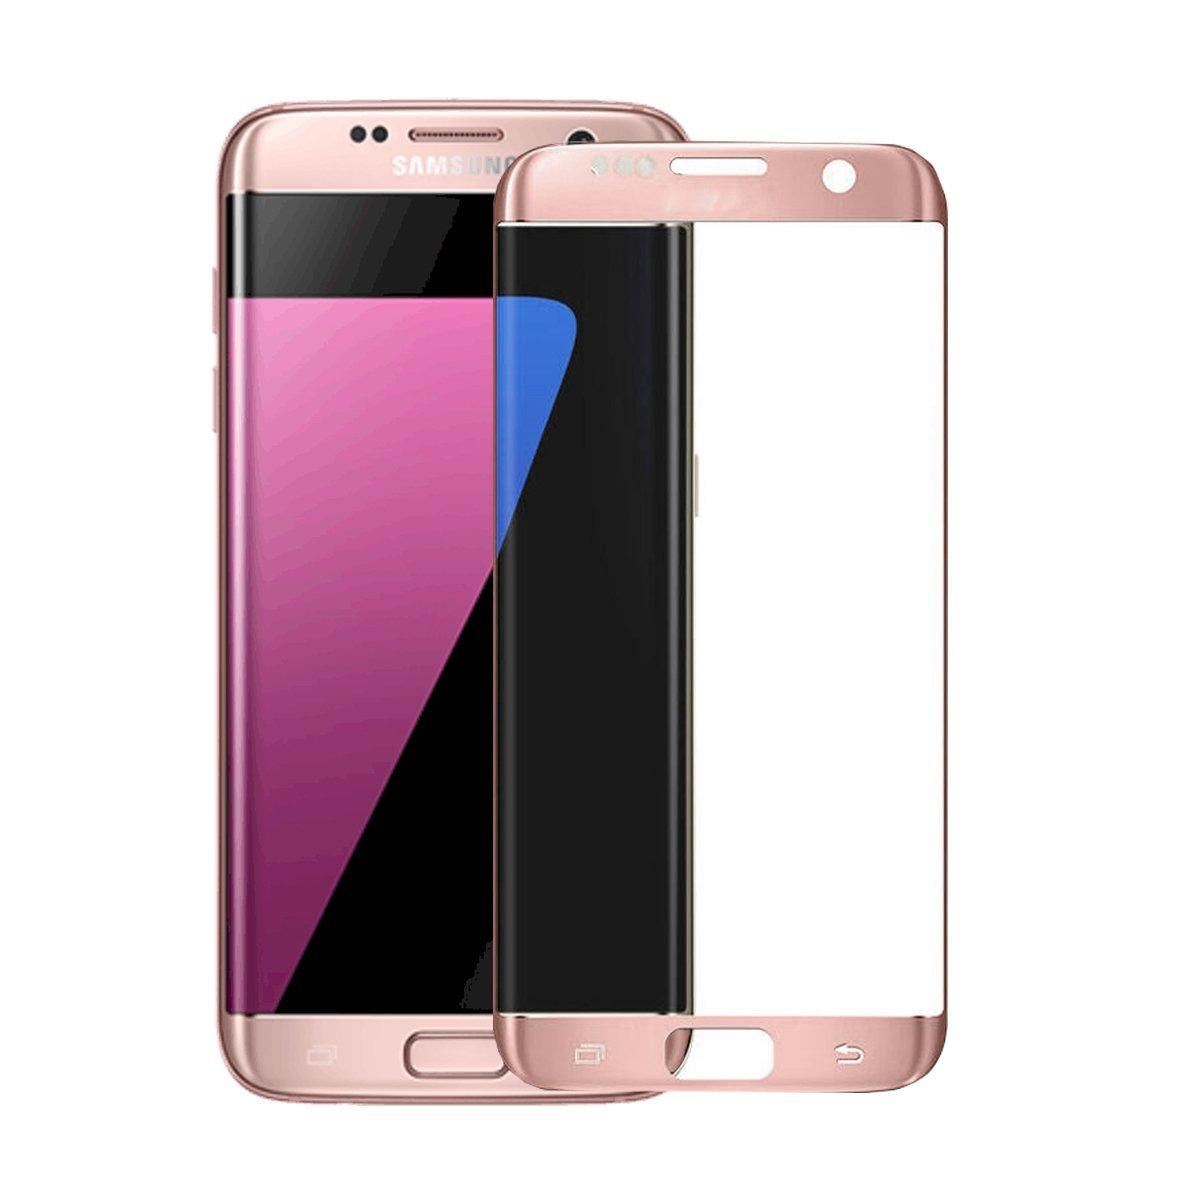 3D zakřivené tvrzené sklo 9H pro Samsung Galaxy S7 Edge - Růžové (rose)